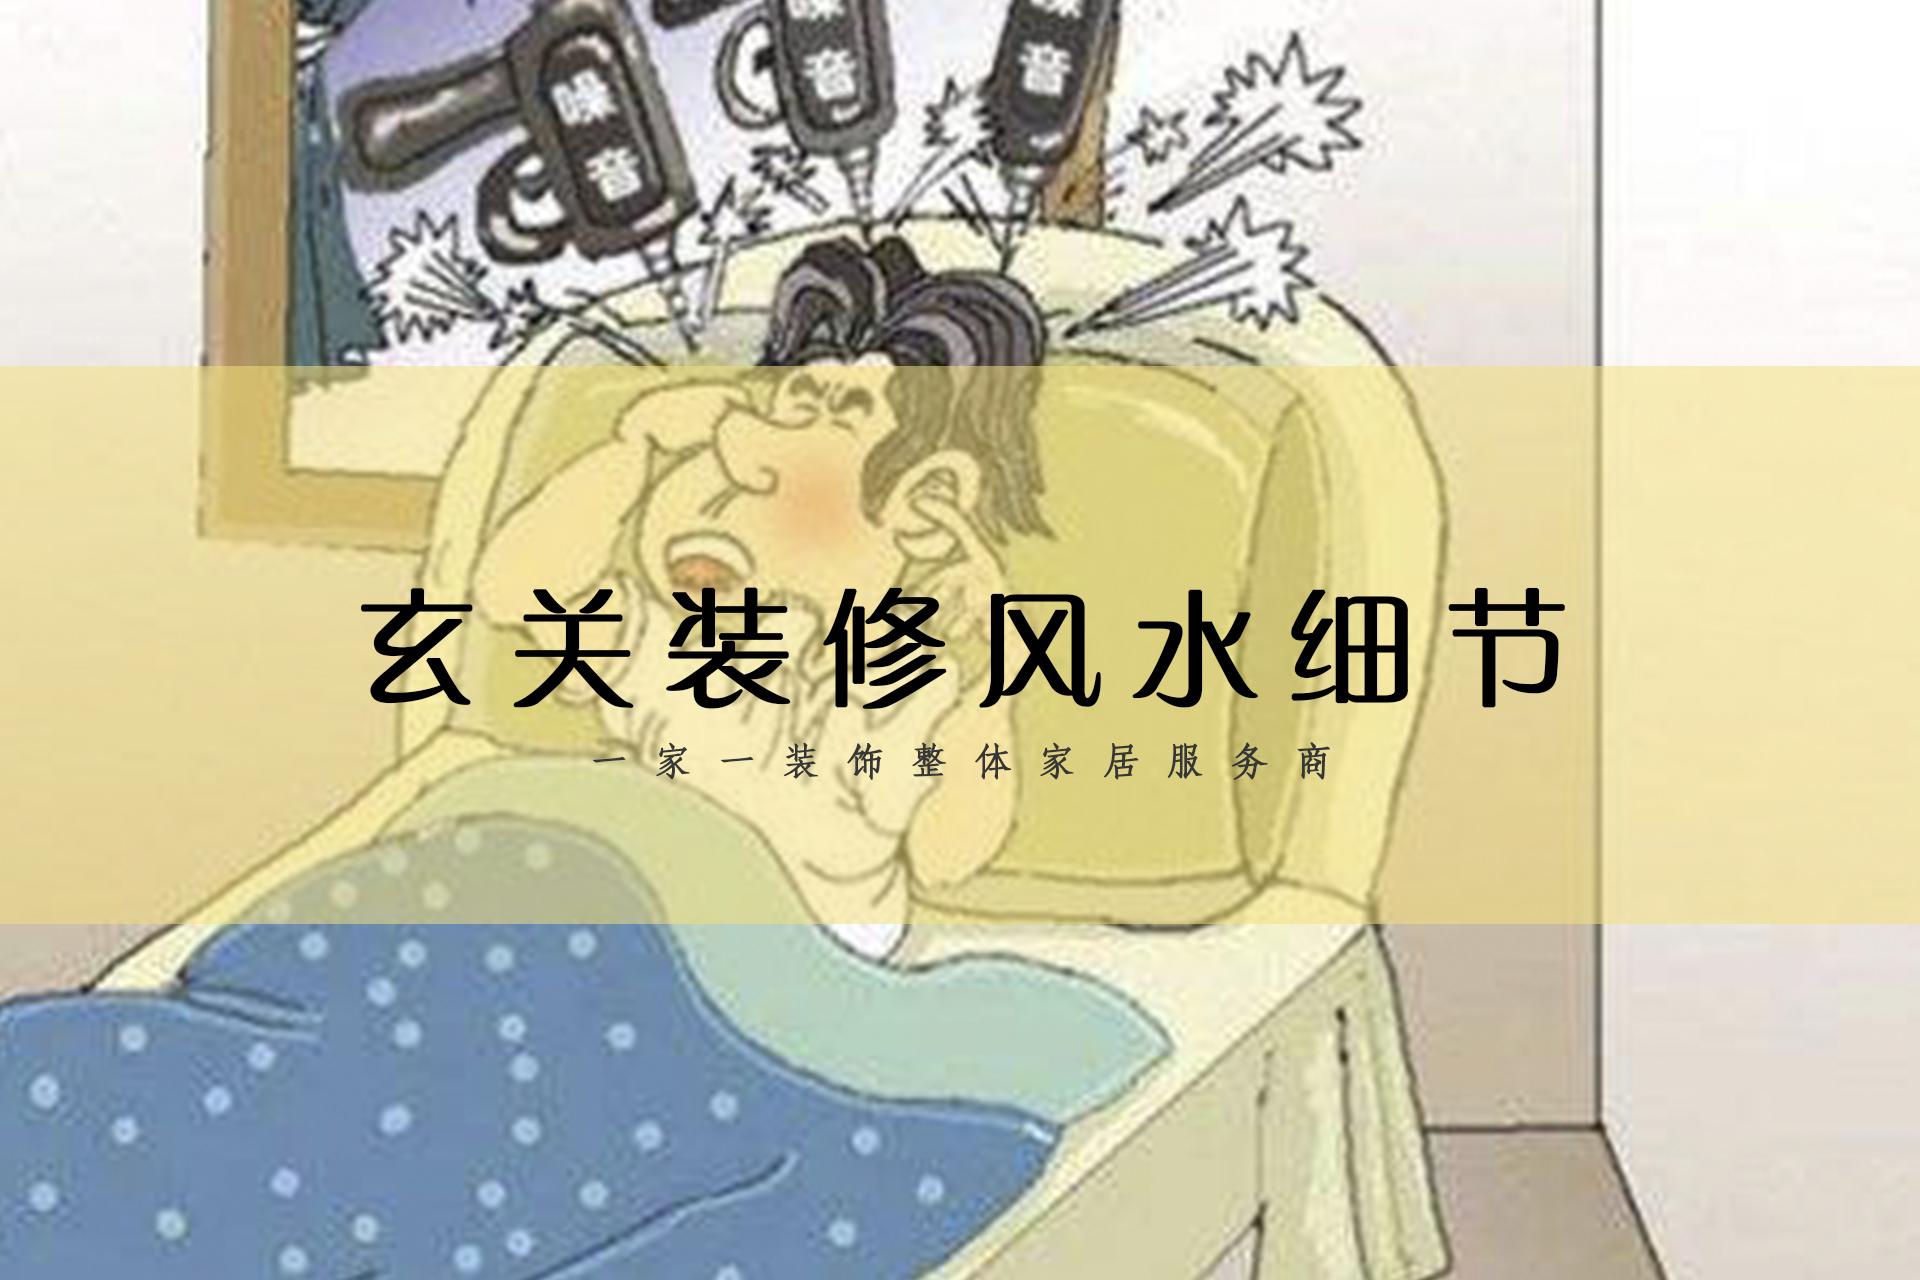 [!--keyboard--]